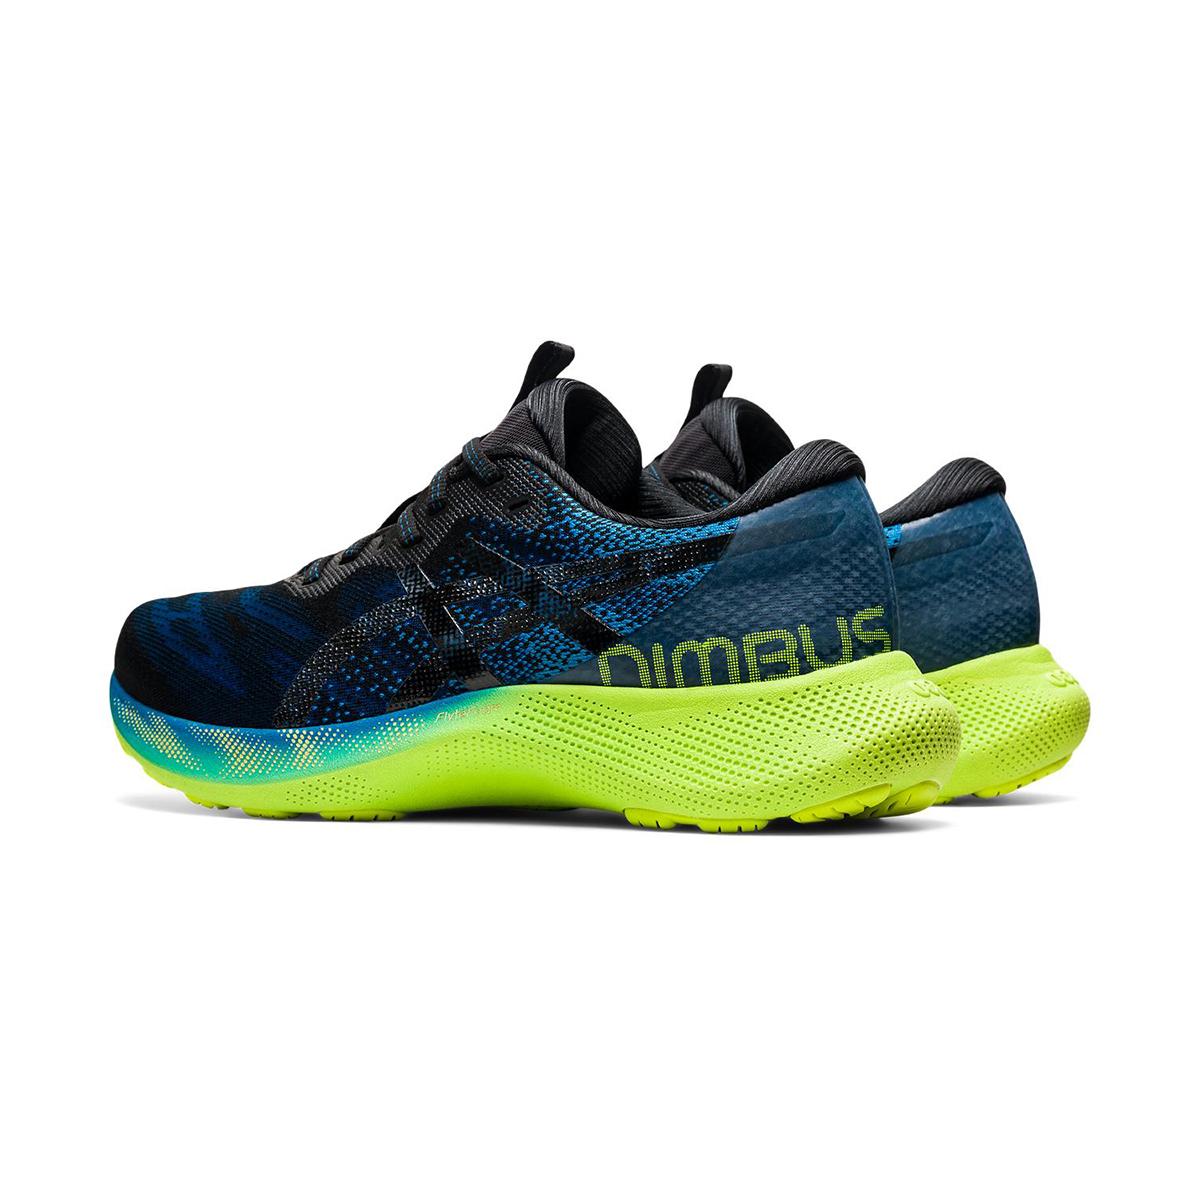 Men's Asics Gel-Nimbus Lite 2 Running Shoe - Color: Reborn Blue/Black - Size: 7 - Width: Regular, Reborn Blue/Black, large, image 4